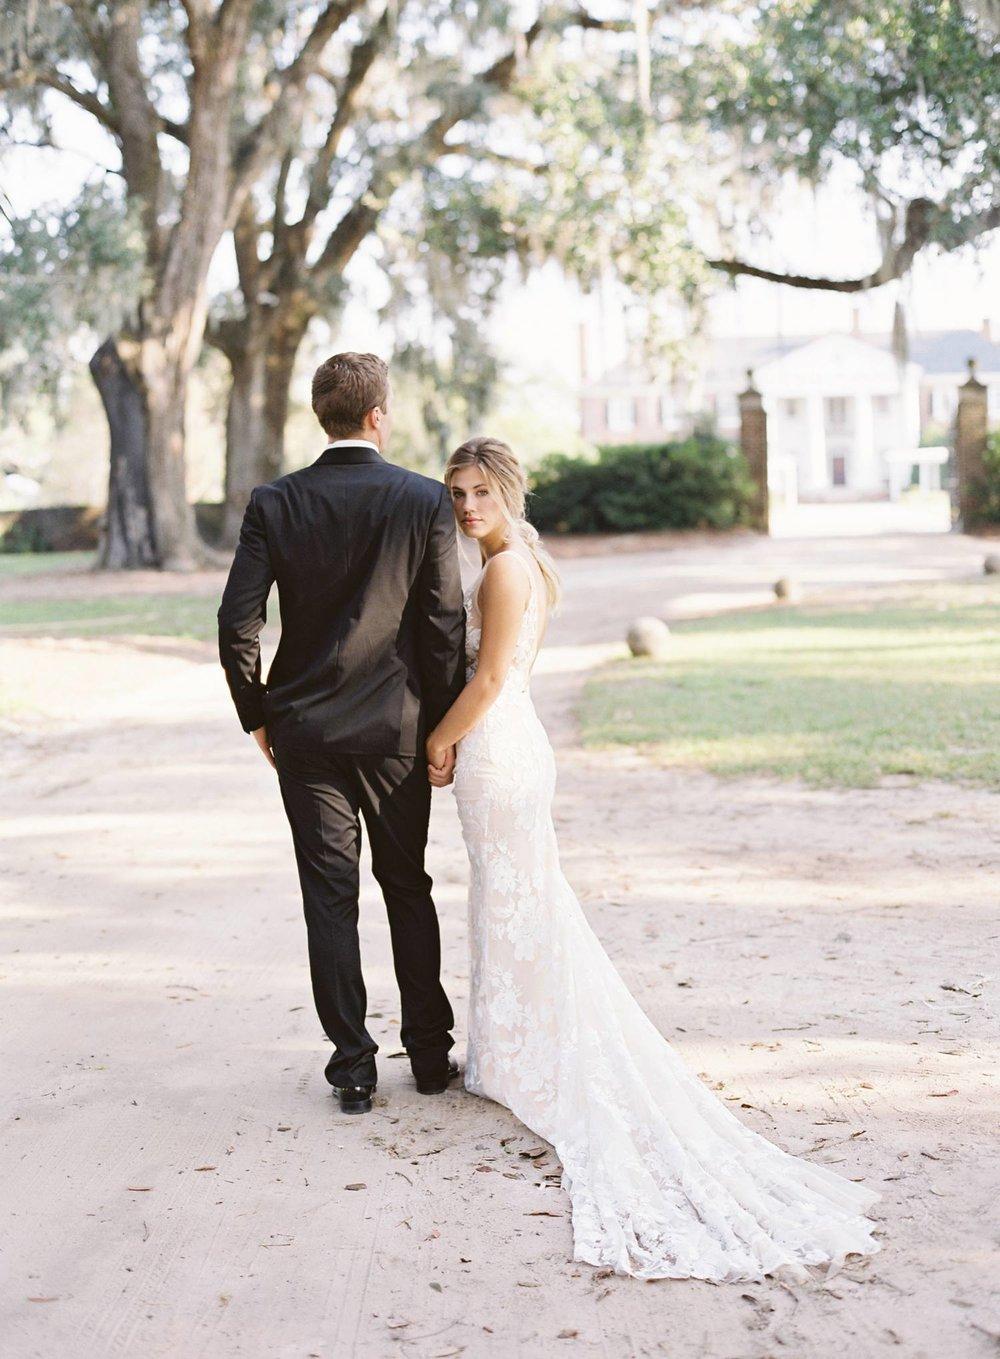 boonehallplantation_wedding_8.jpg